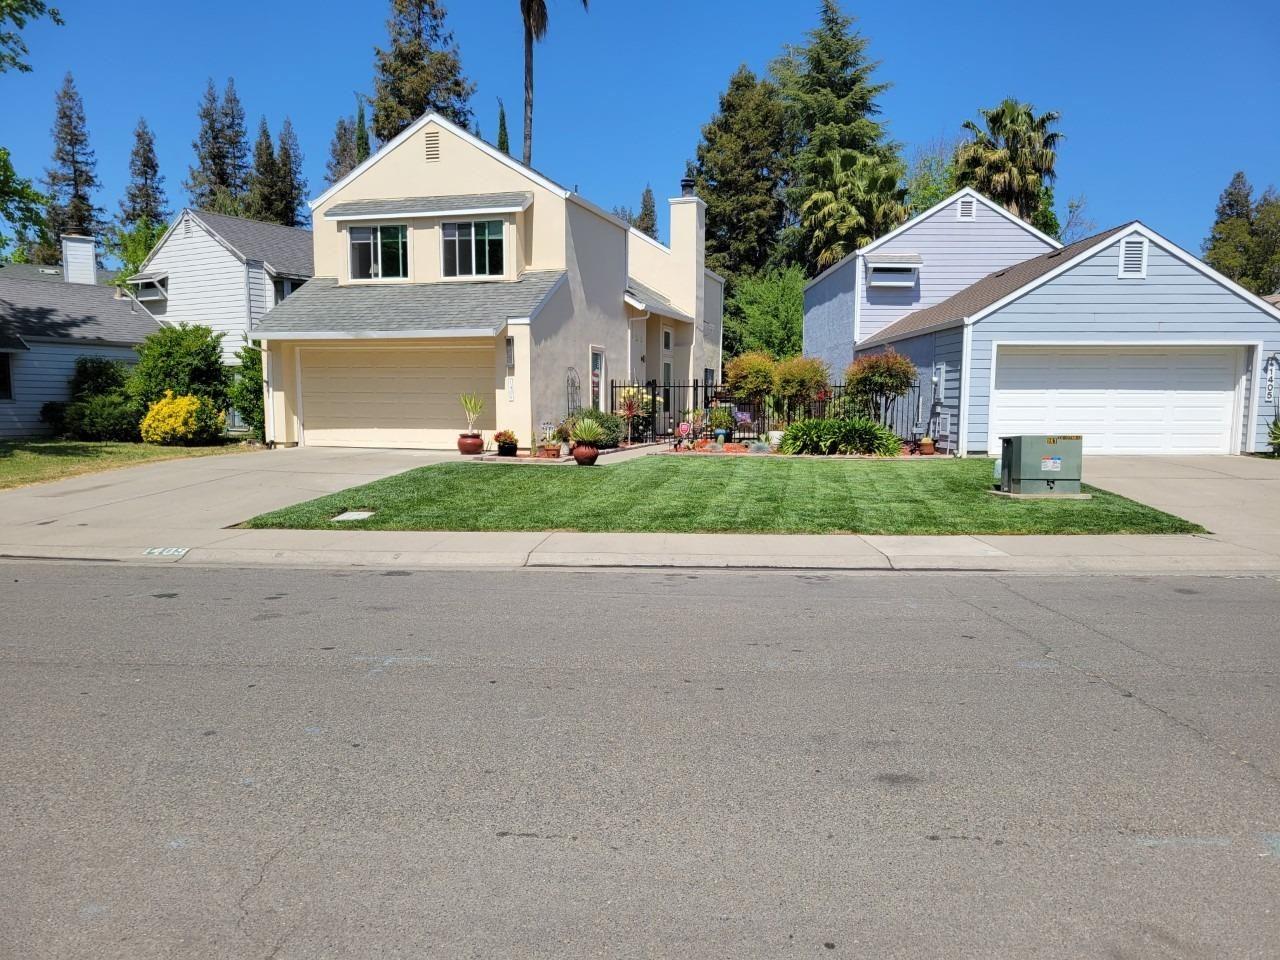 1409 Helmsman Way, Sacramento, CA 95833 - MLS#: 221114647